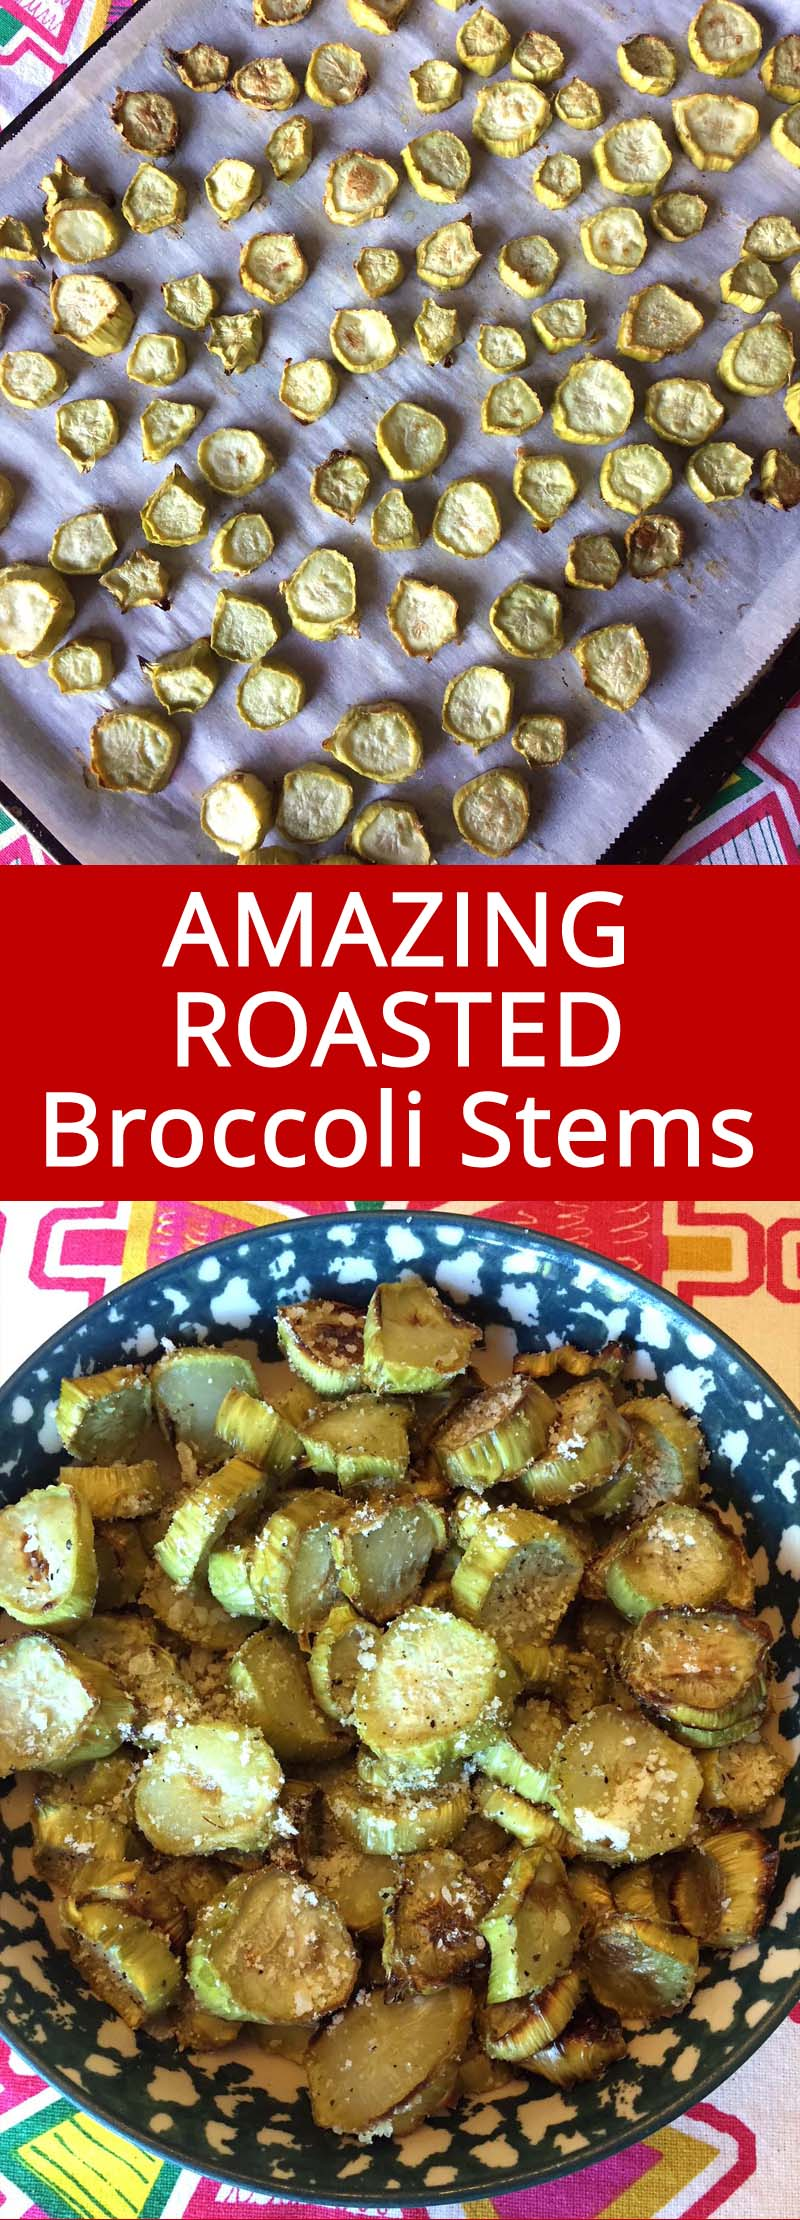 Roasted Broccoli Stems recipe - so good! Perfect way to use up broccoli stalks!